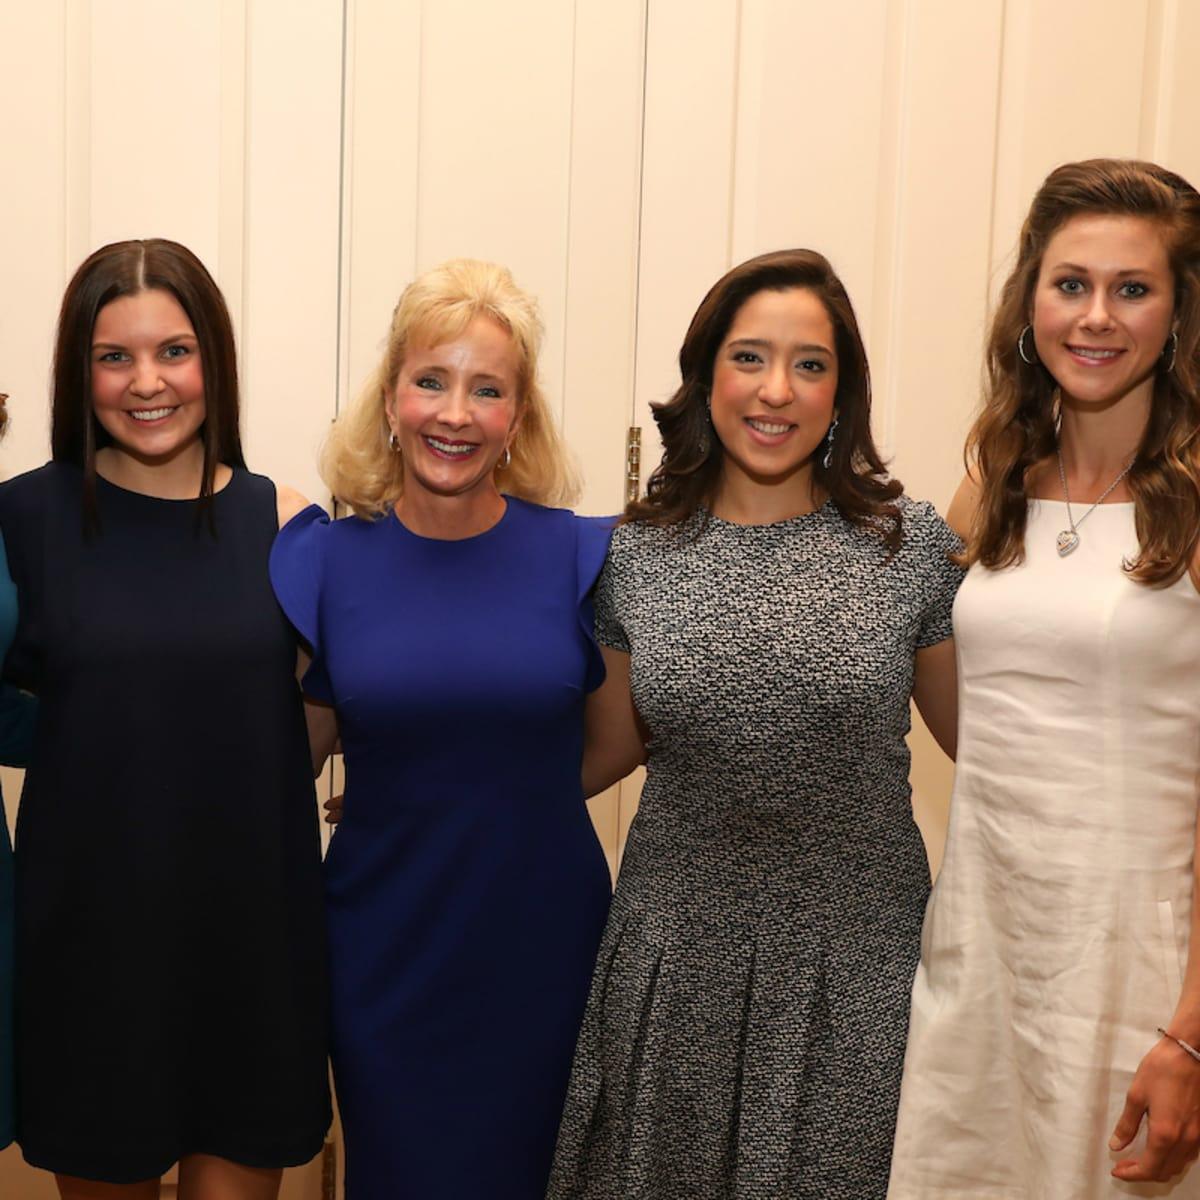 Amber Carter, Kayleigh Lamphere, Dr. Allison Edwards, Bianca Maciel, and Belle MacFarlane